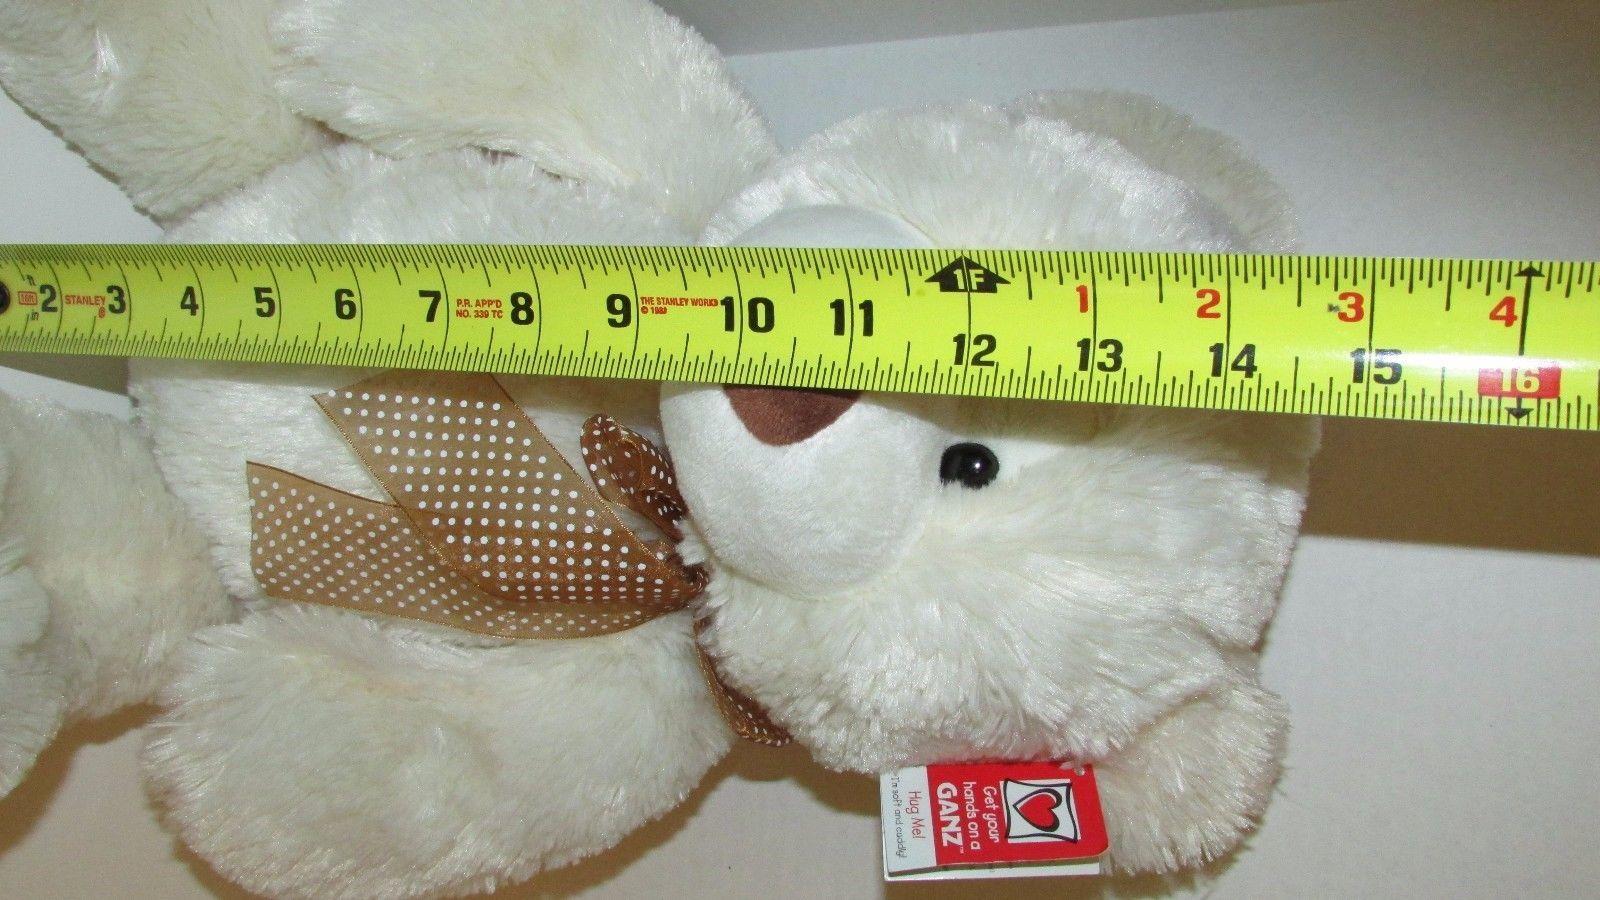 "Ganz Plush large cream stuffed teddy bear brown nose polka dot bow 13-18"" w/ tag"